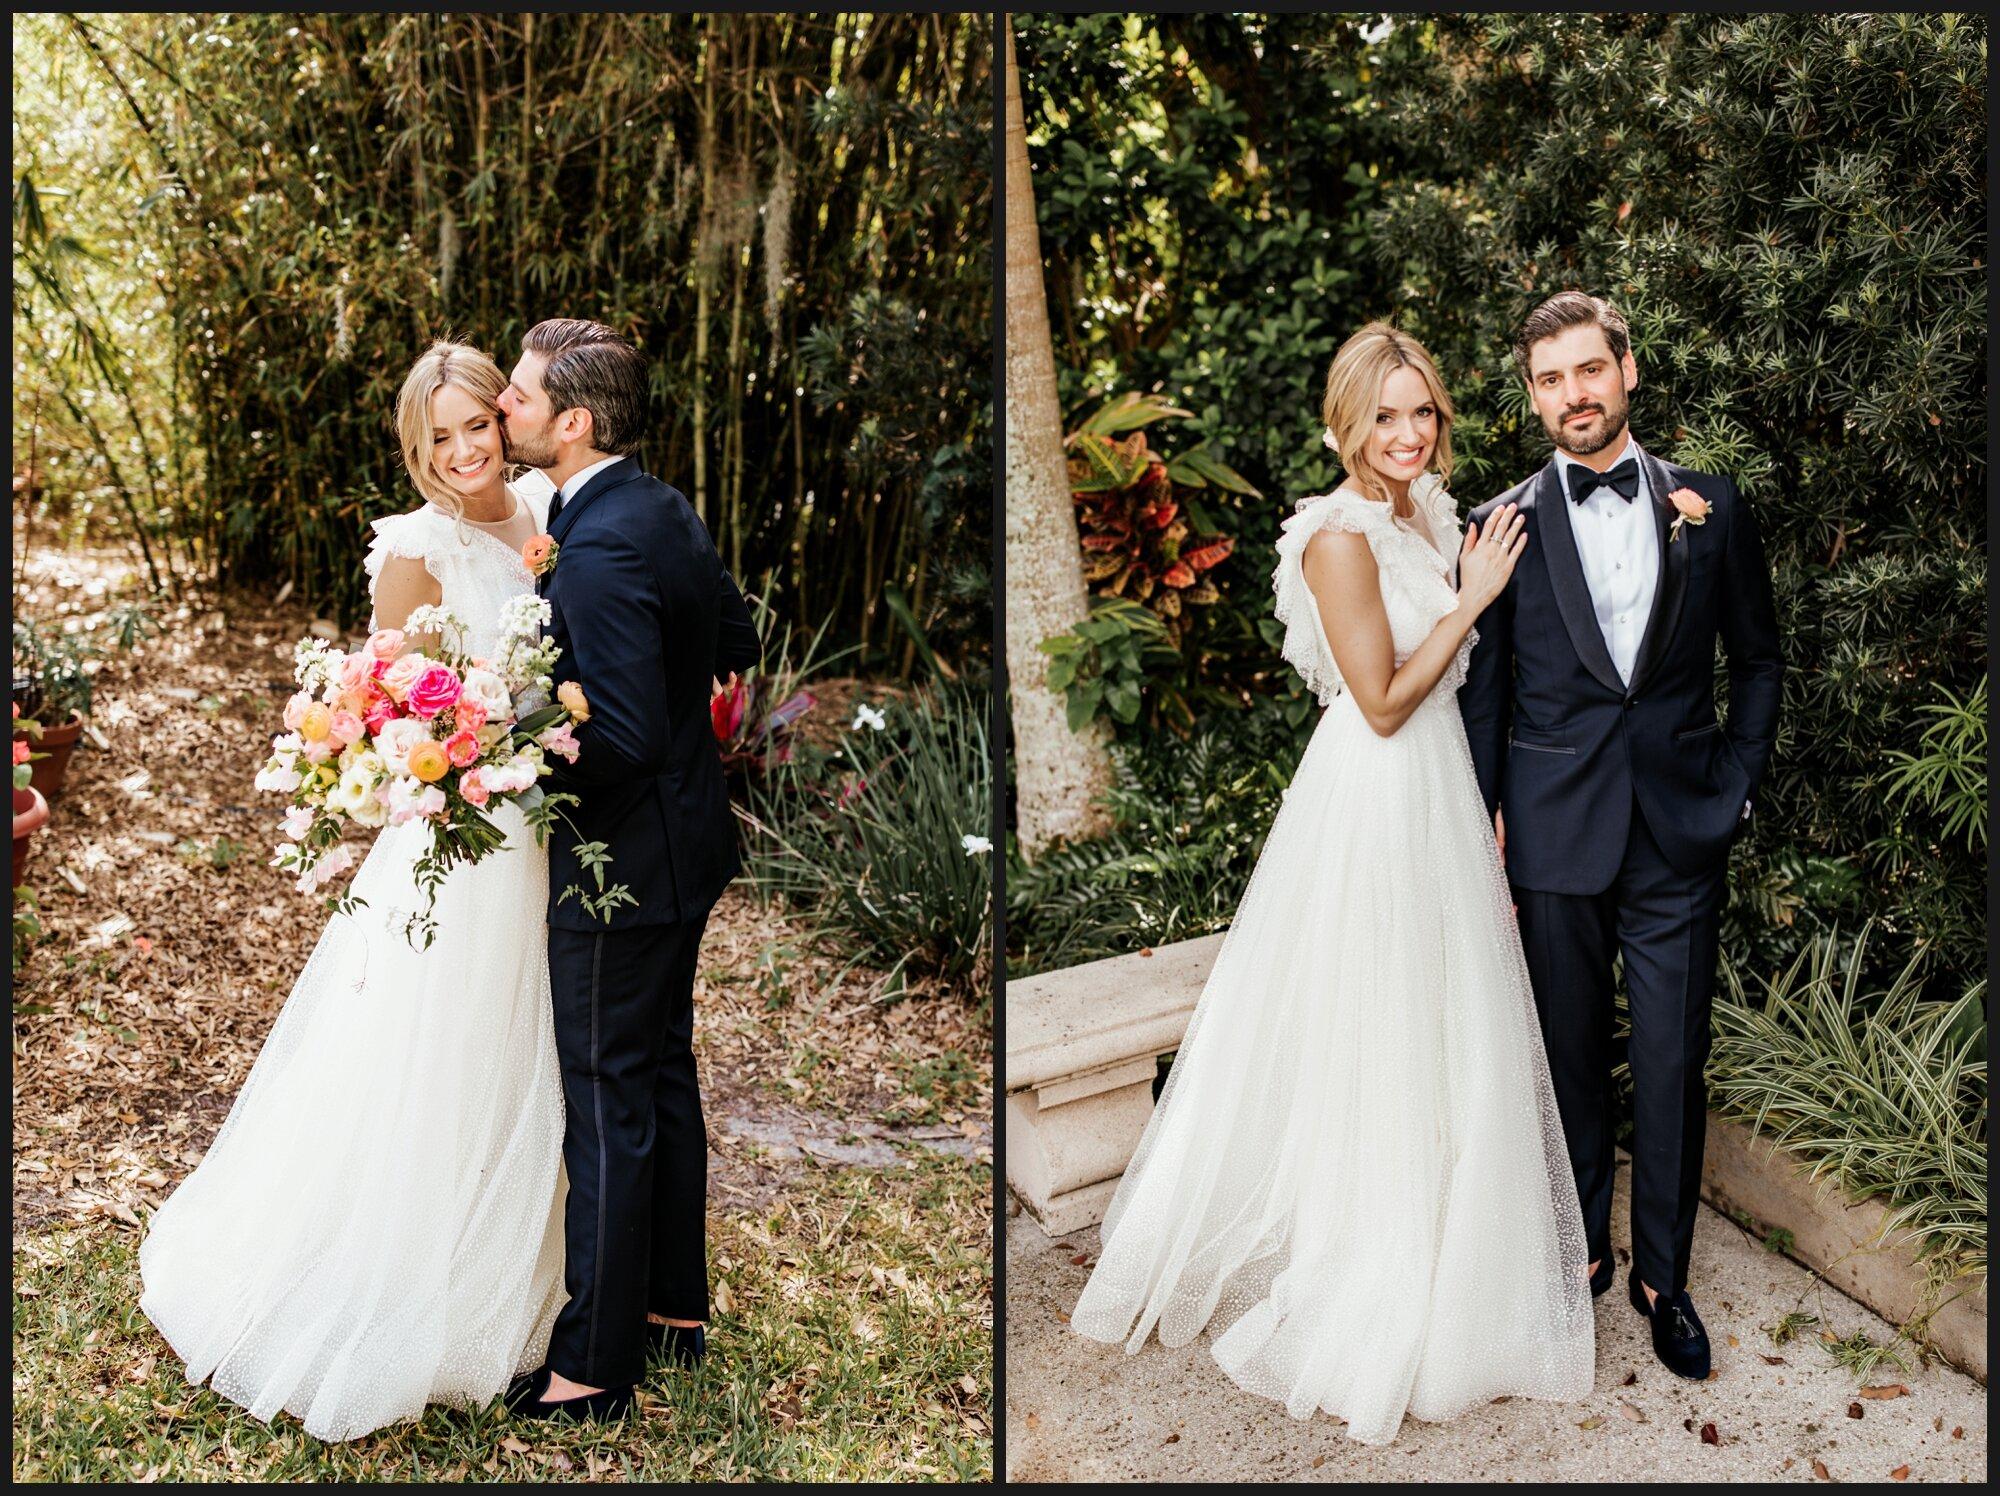 Orlando-Wedding-Photographer-destination-wedding-photographer-florida-wedding-photographer-hawaii-wedding-photographer_0704.jpg